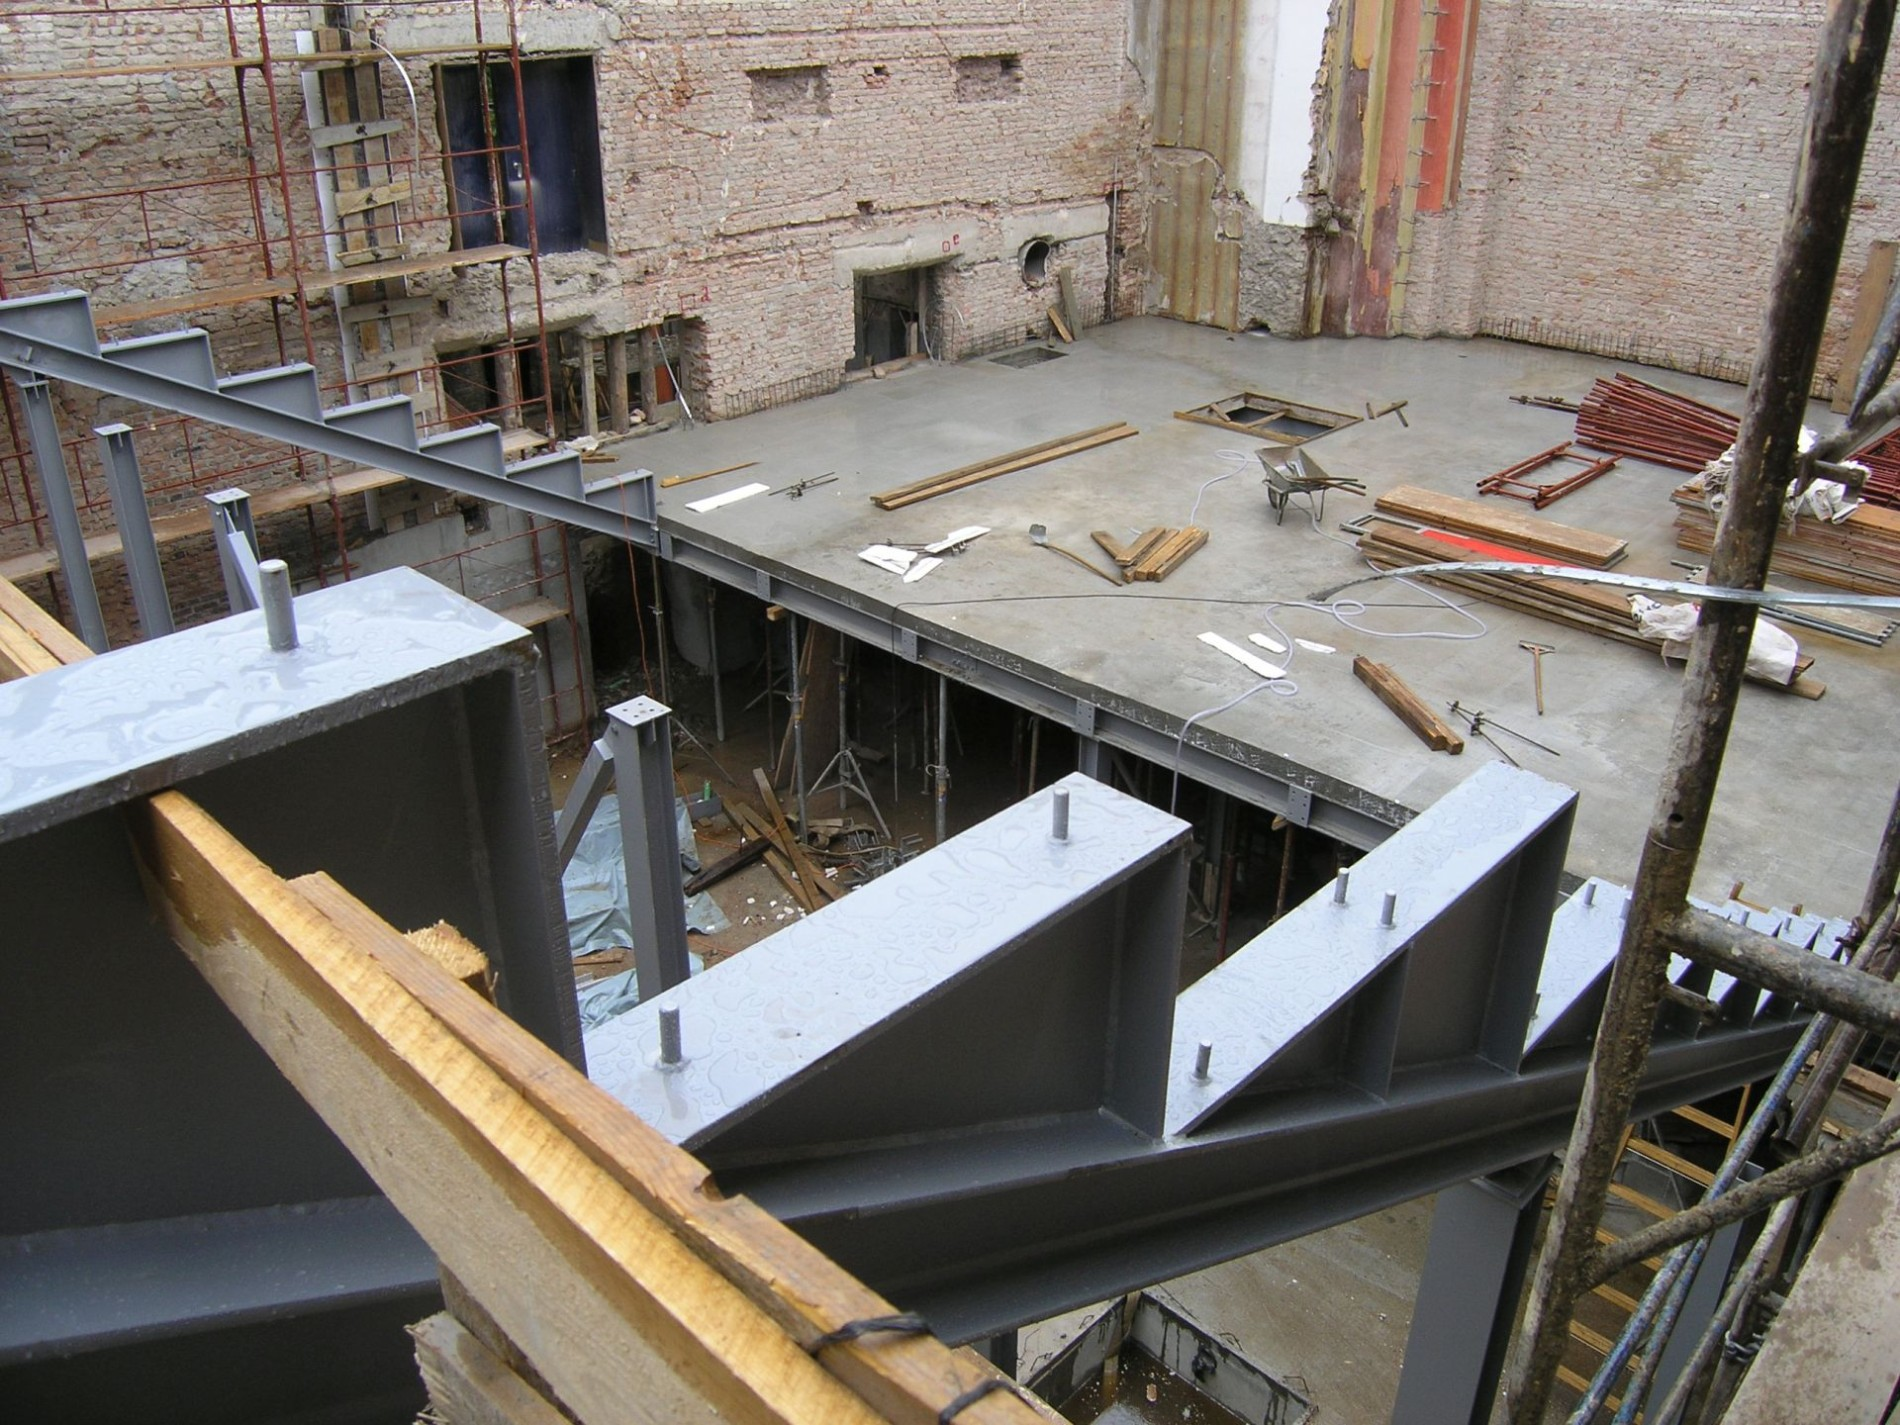 apolo, upi-2m, 3LHD, konstrukcija, structure, concrete, beton, upi2m